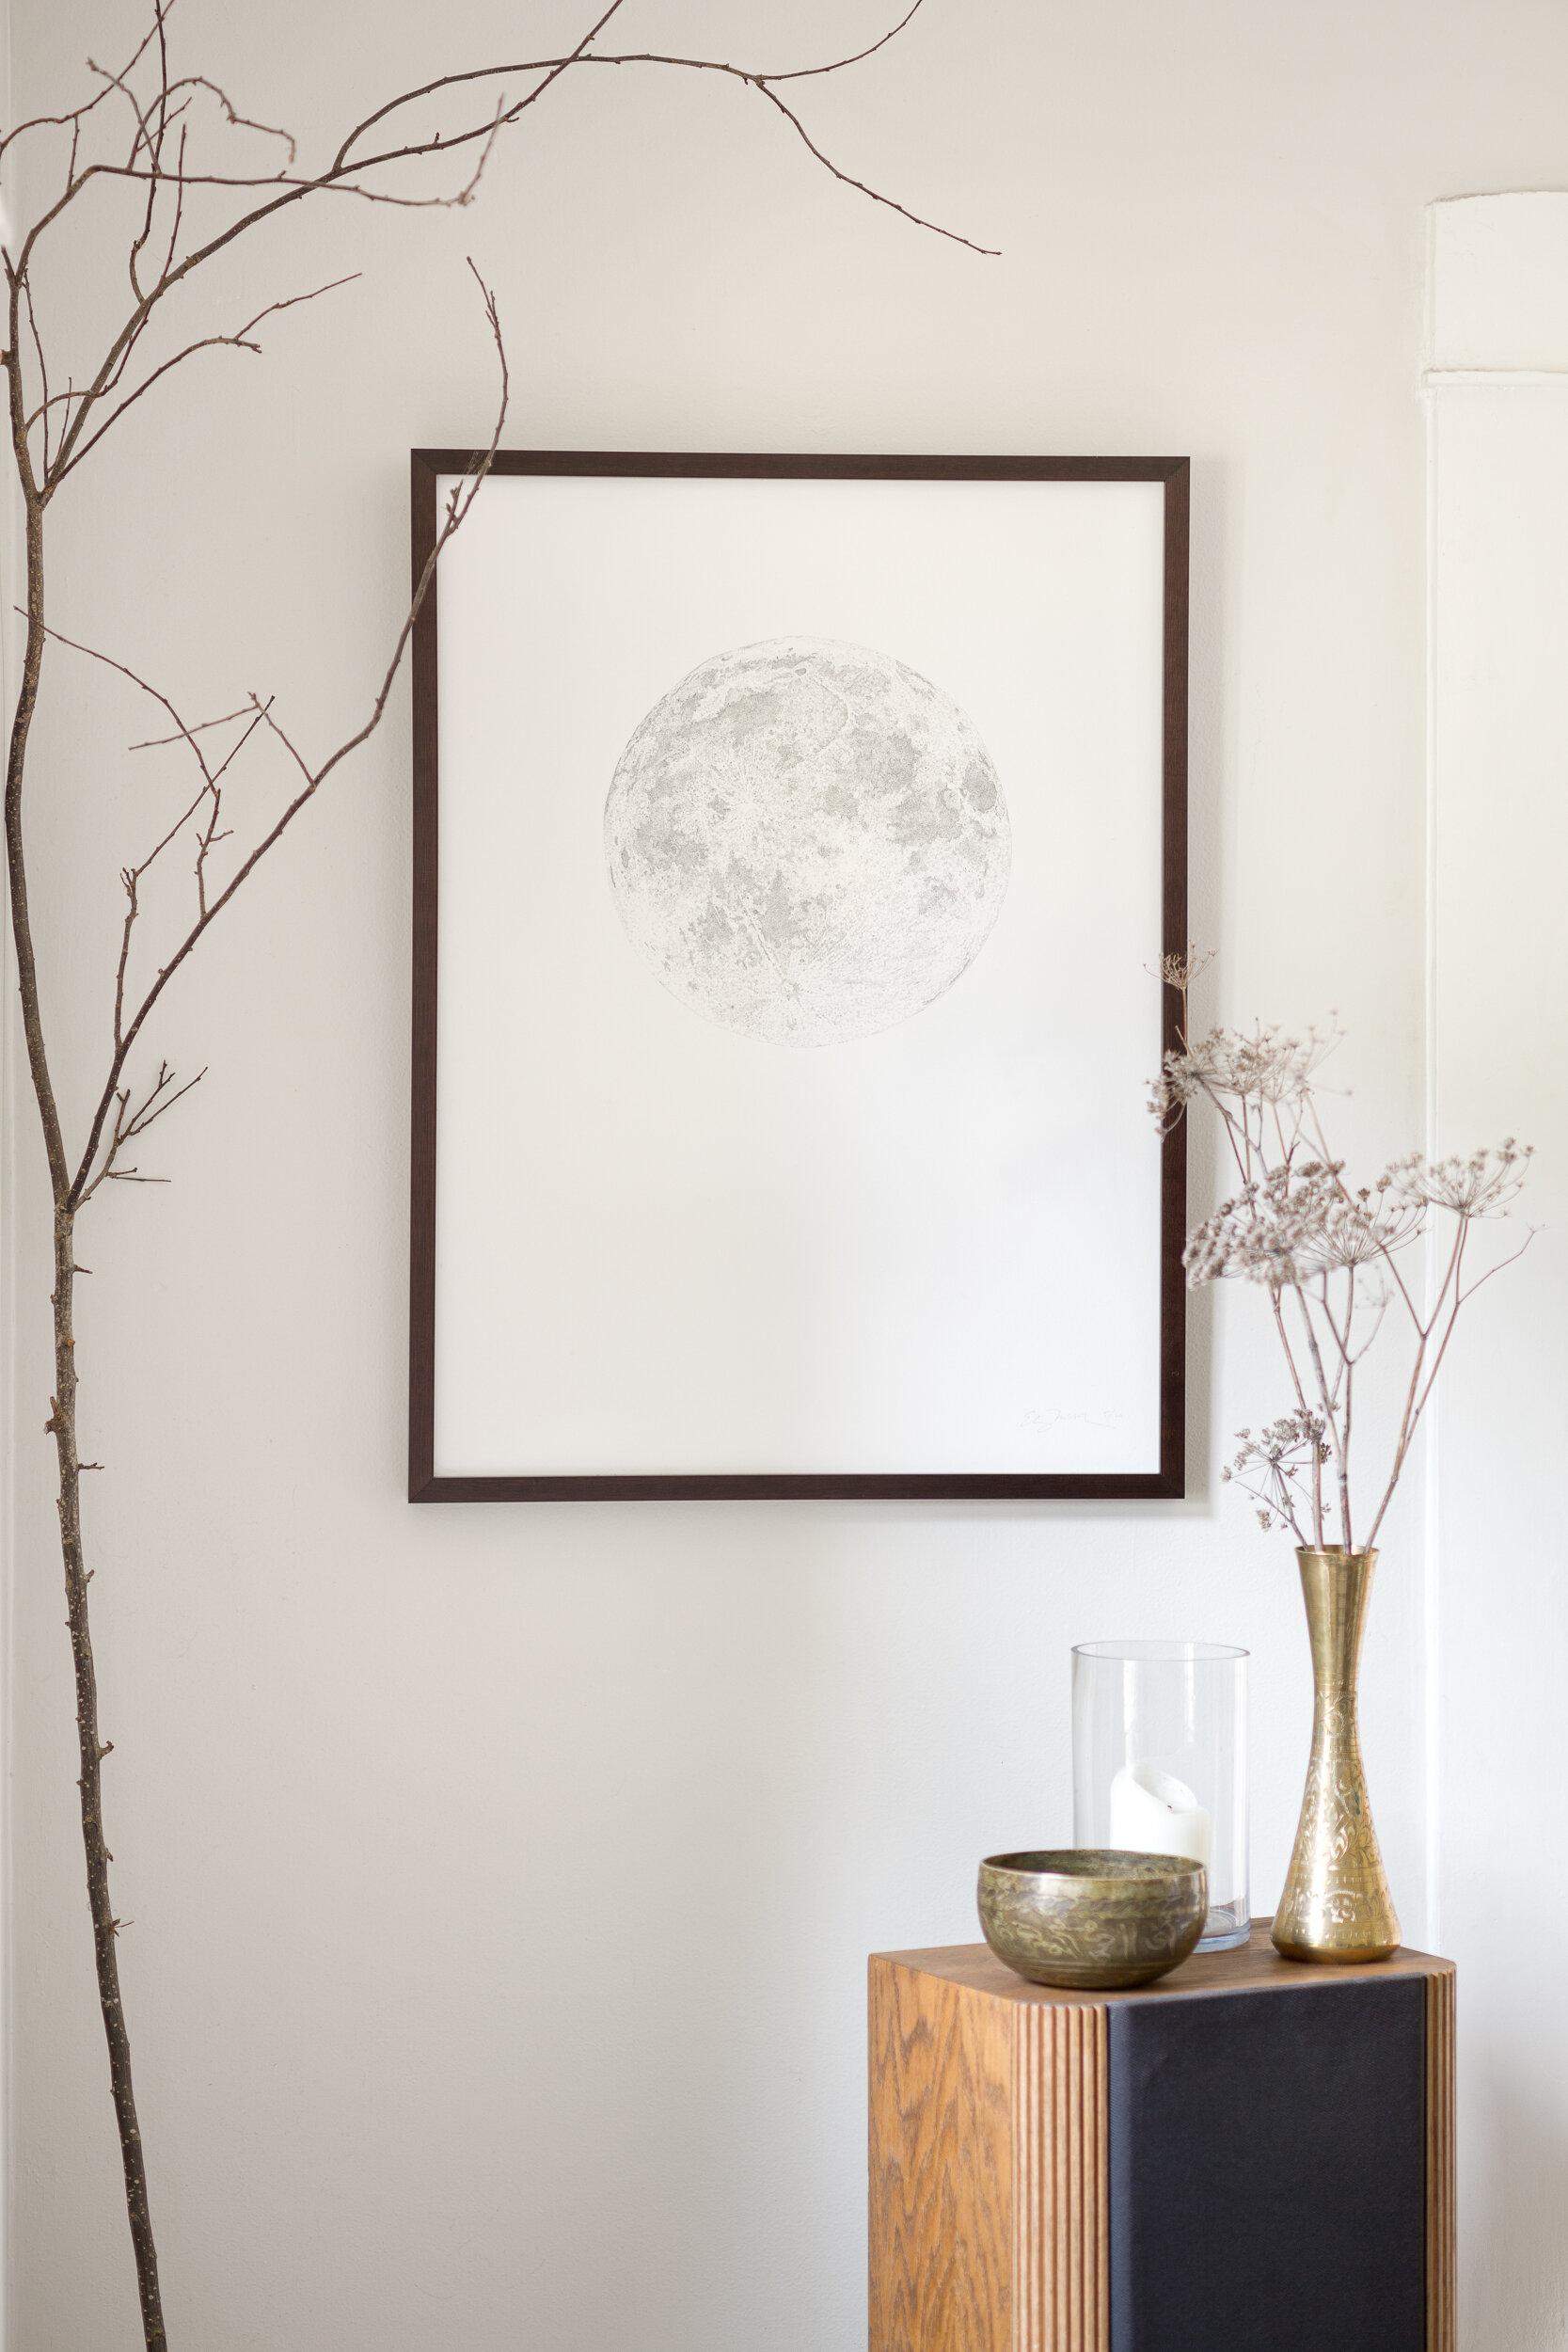 02-LM-Moons-JoshPartee-3393.jpg